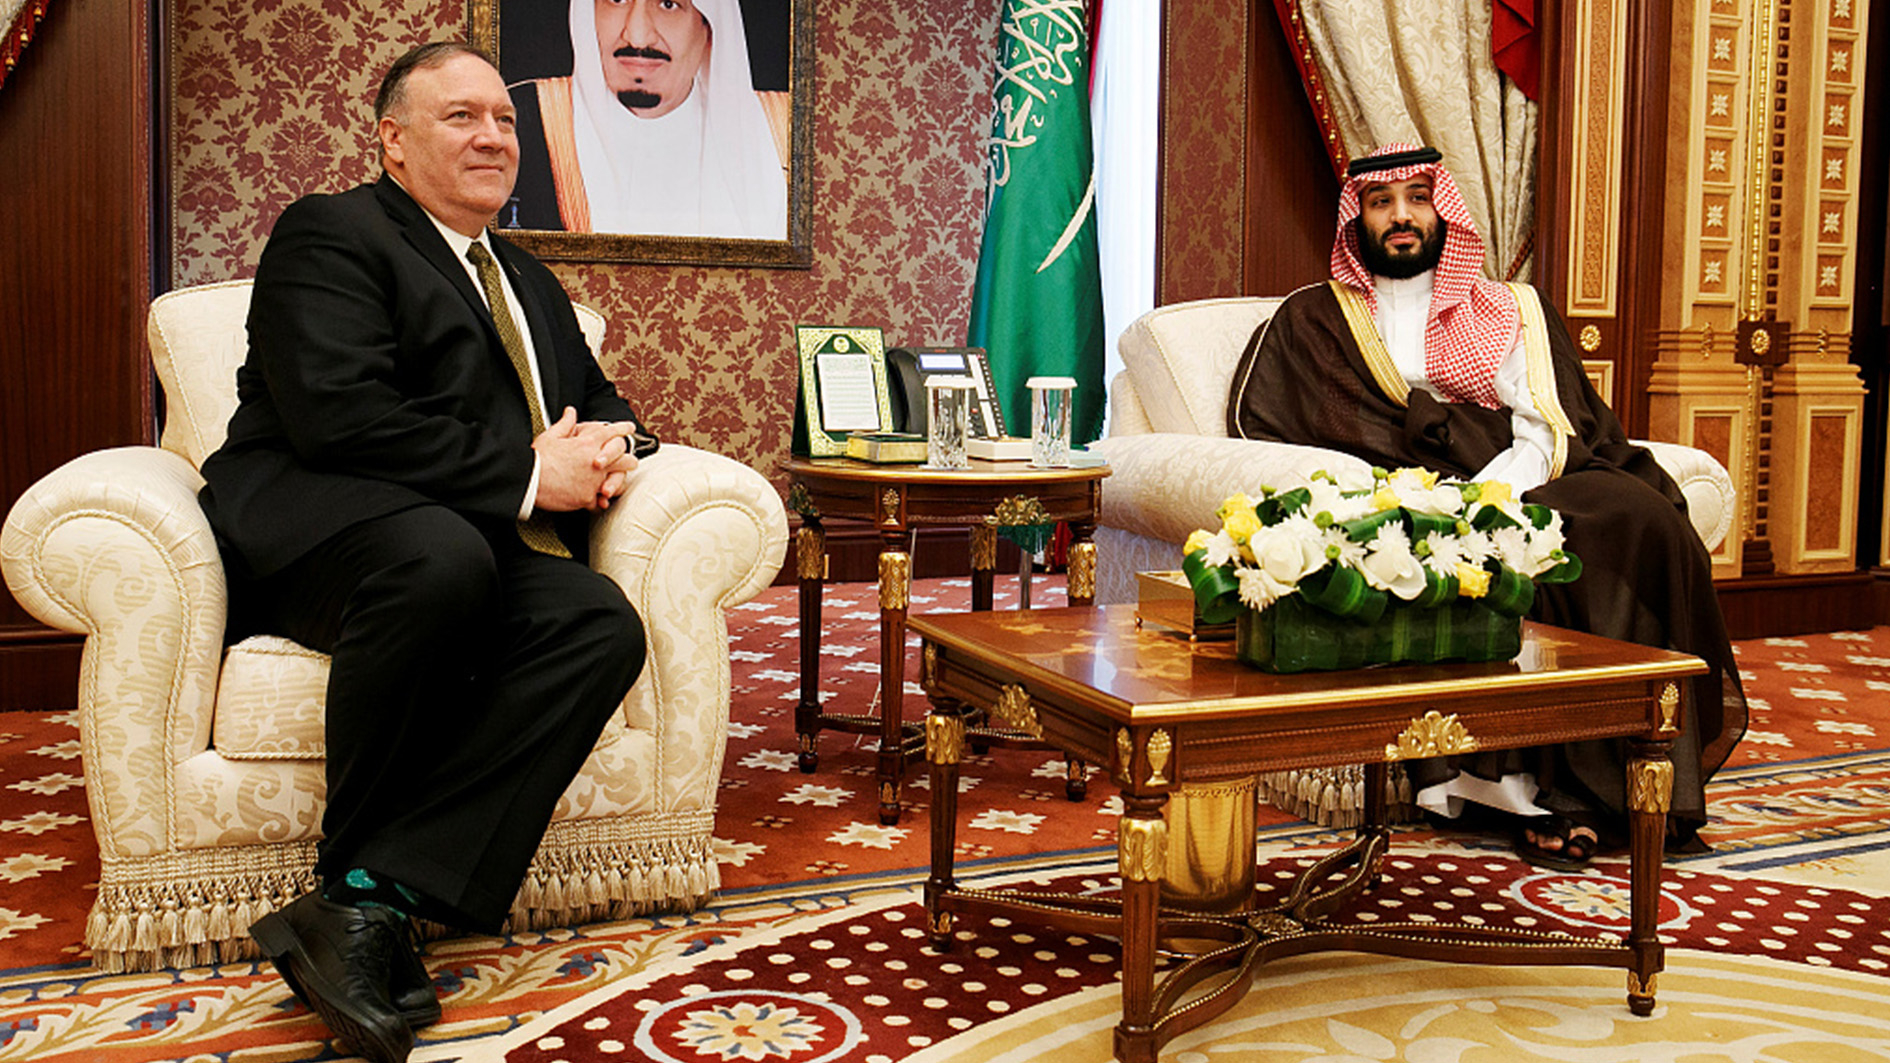 Mecca: A fascinating place in Saudi Arabia to explore - CGTN